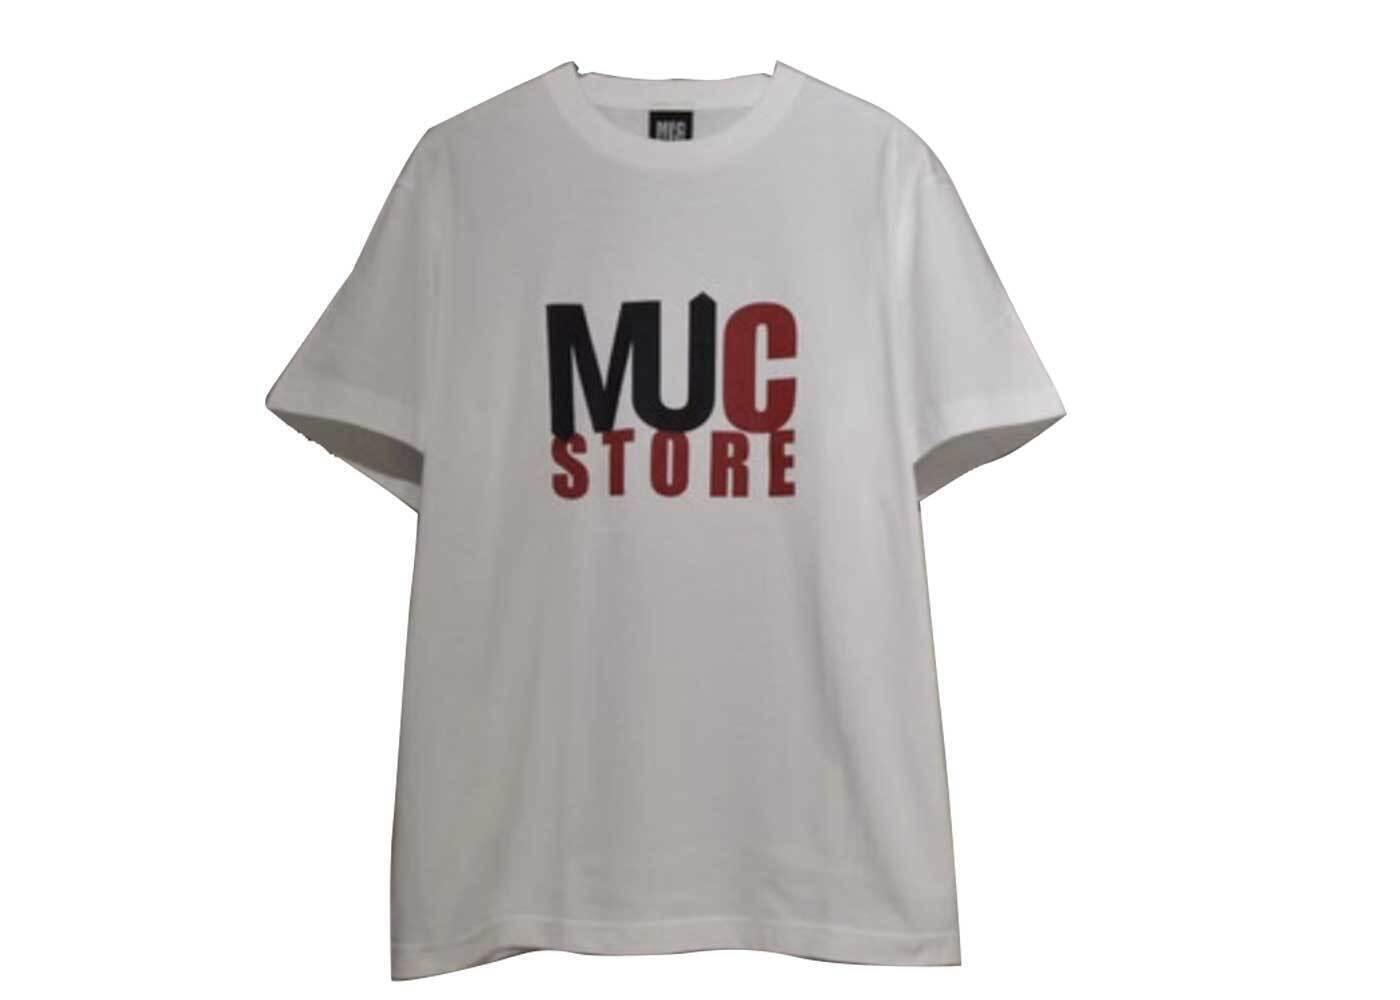 MFC Store × Monokabu Store Tee Whiteの写真